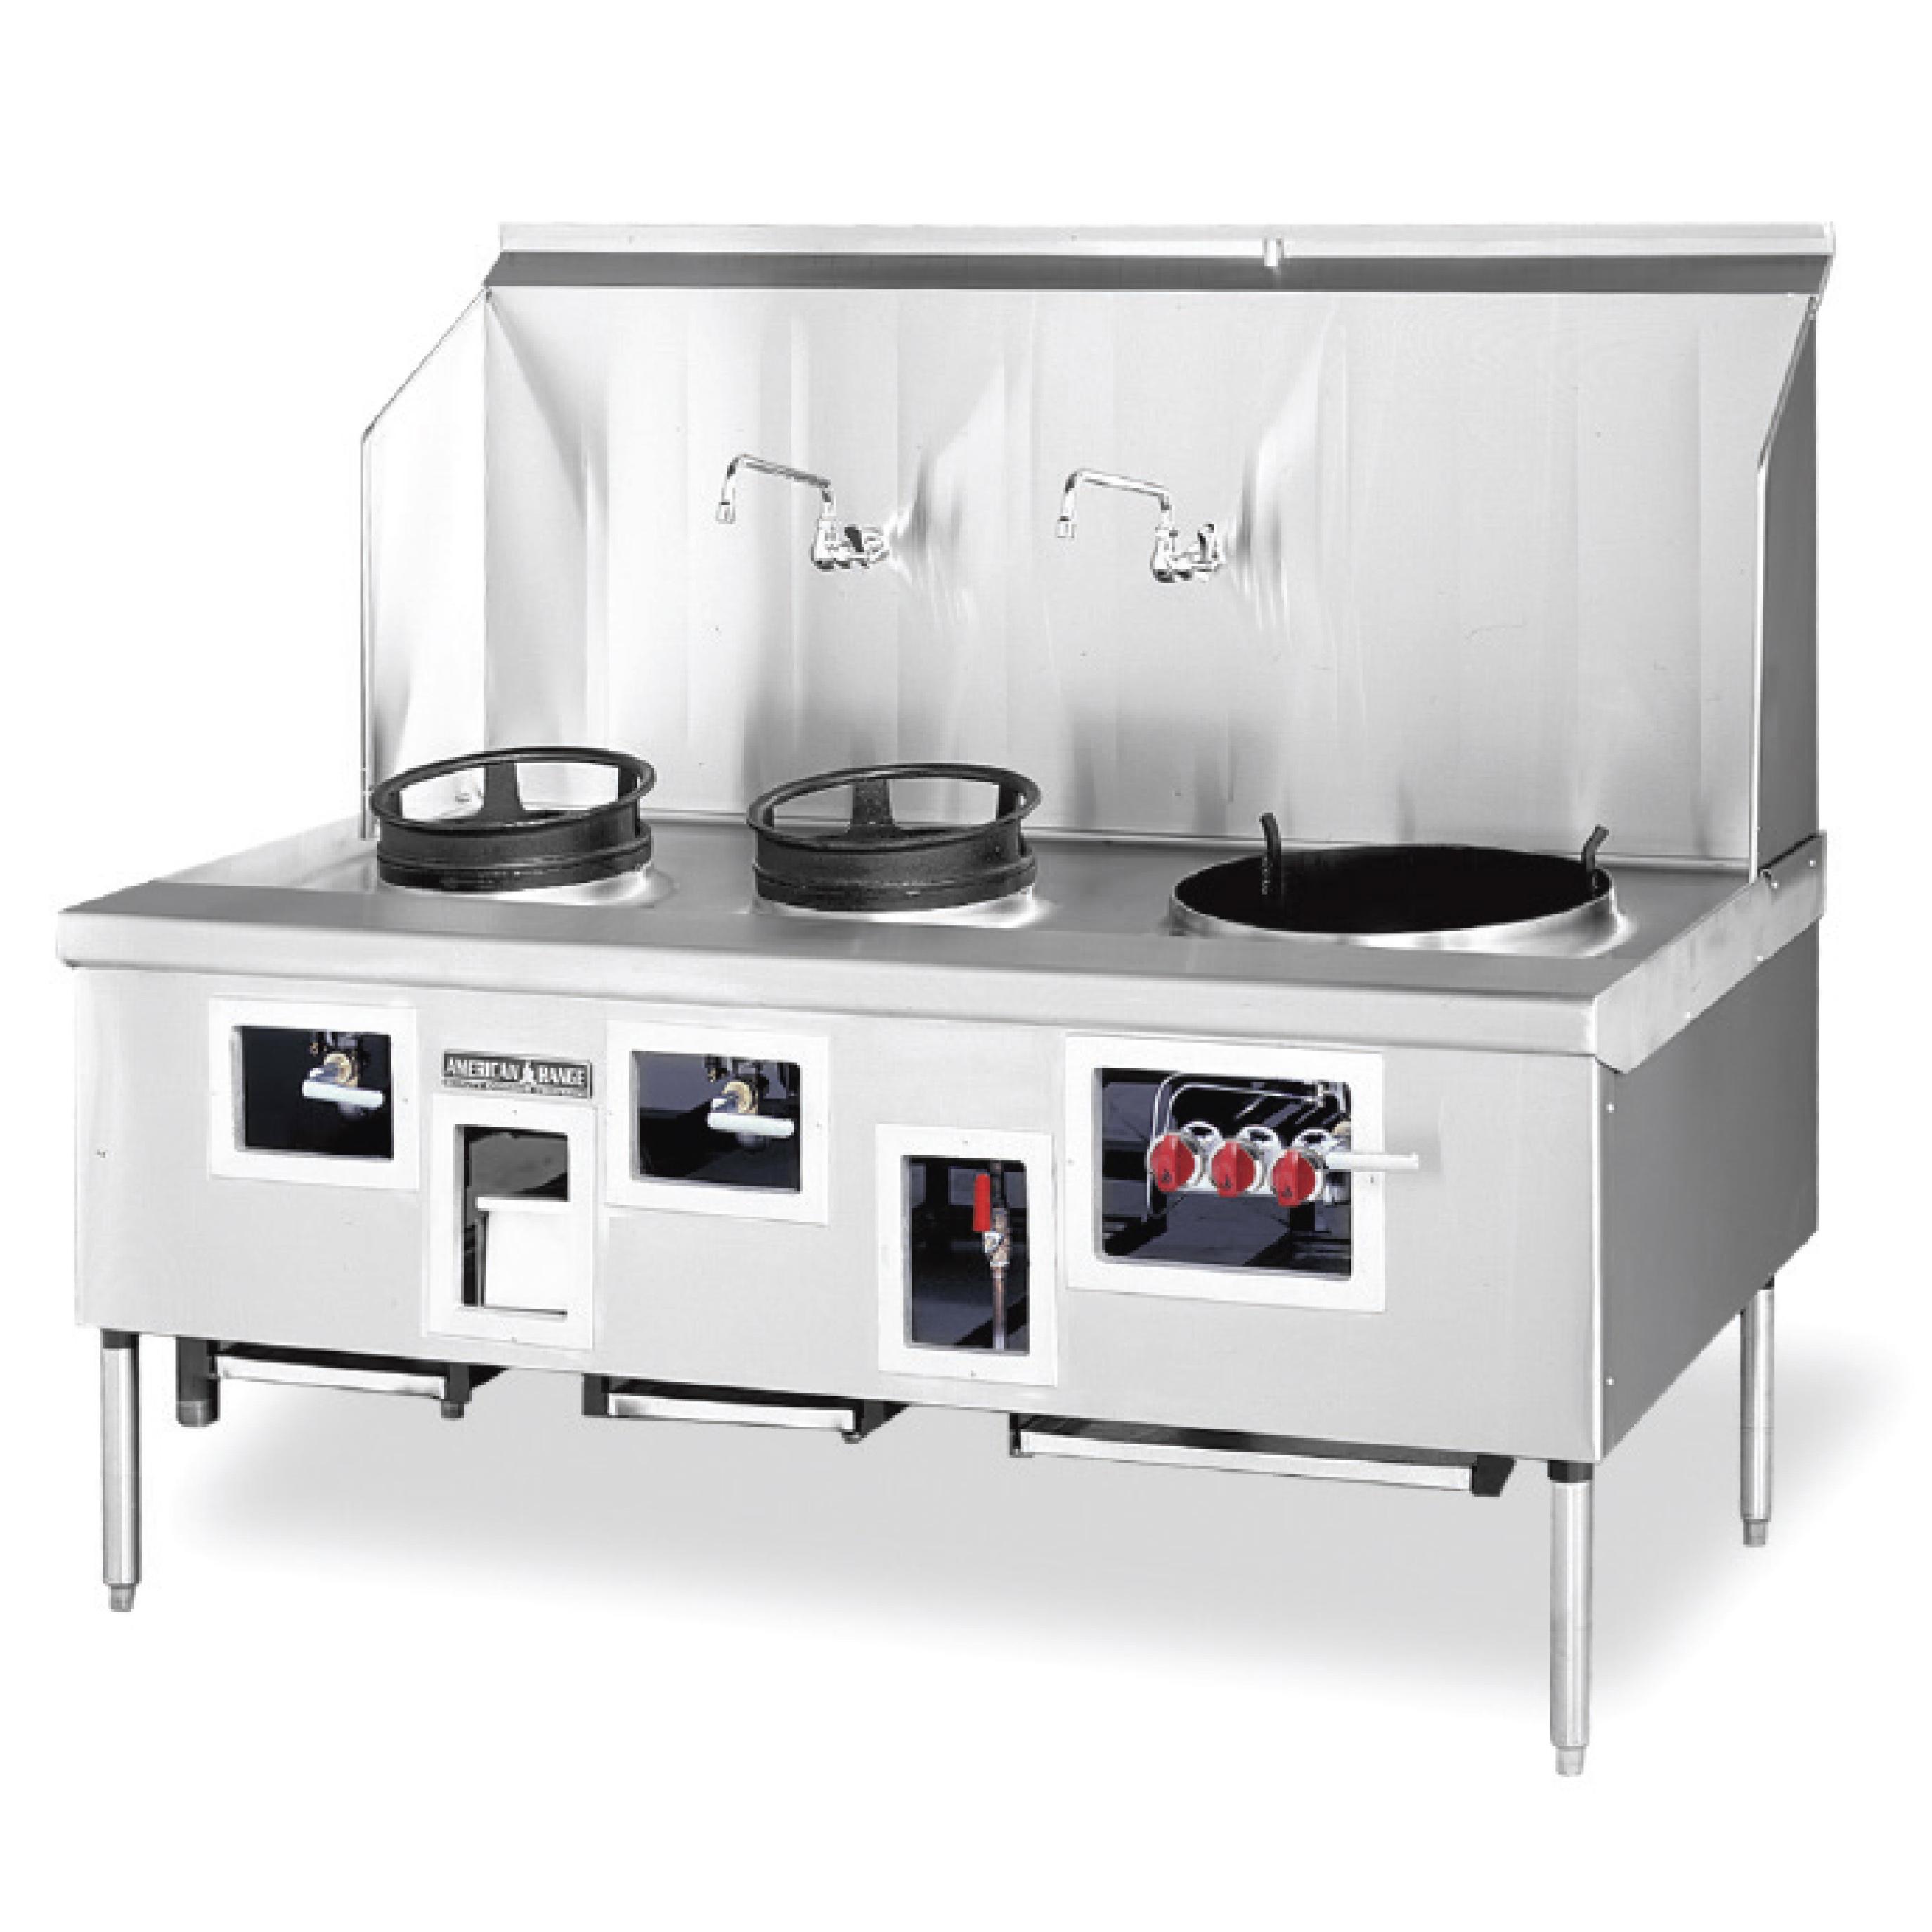 American Range ARCR-2 range, wok, gas